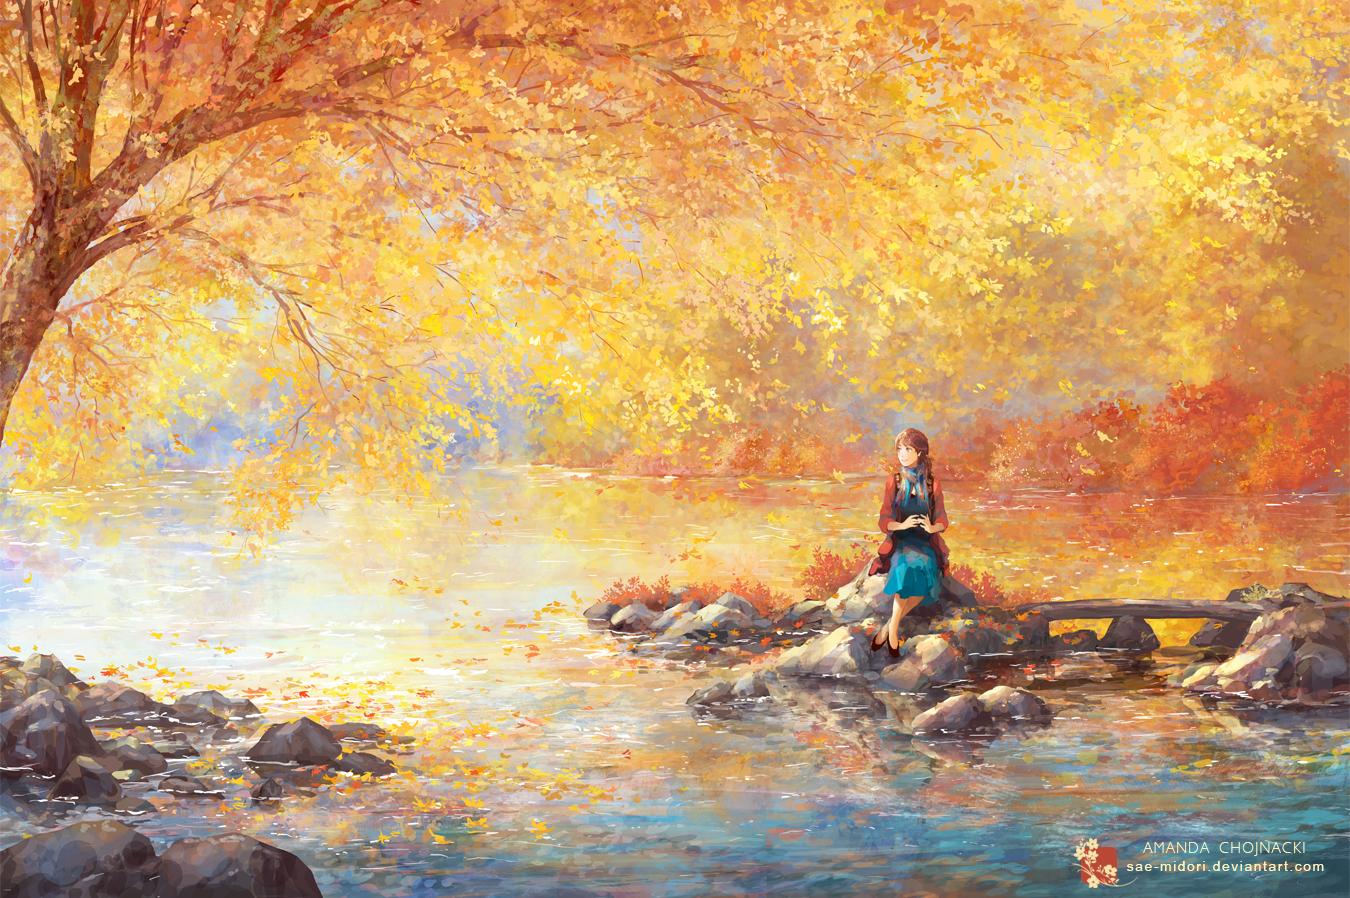 The Splendor of Autumn by sae-midori